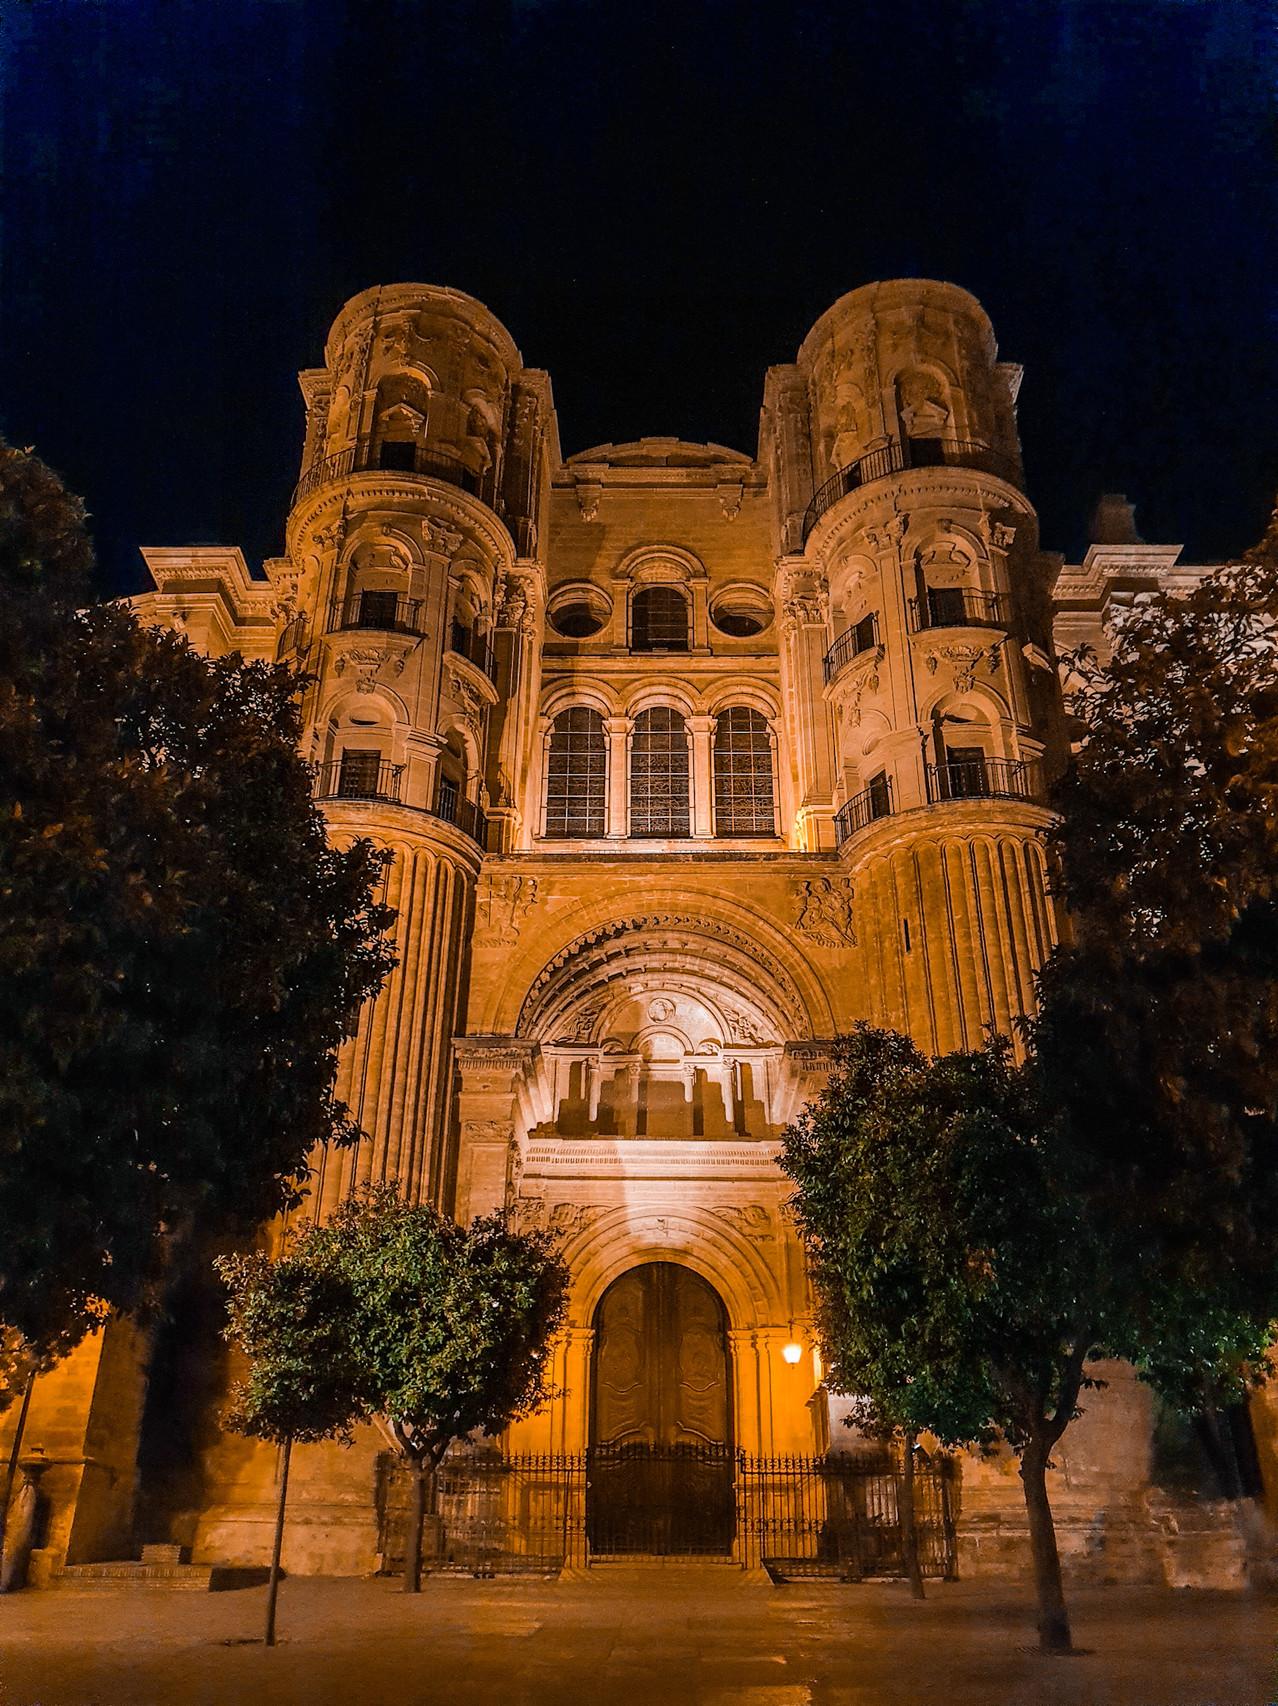 Cathedral Santa Iglesia Nighttime Olivia Libi